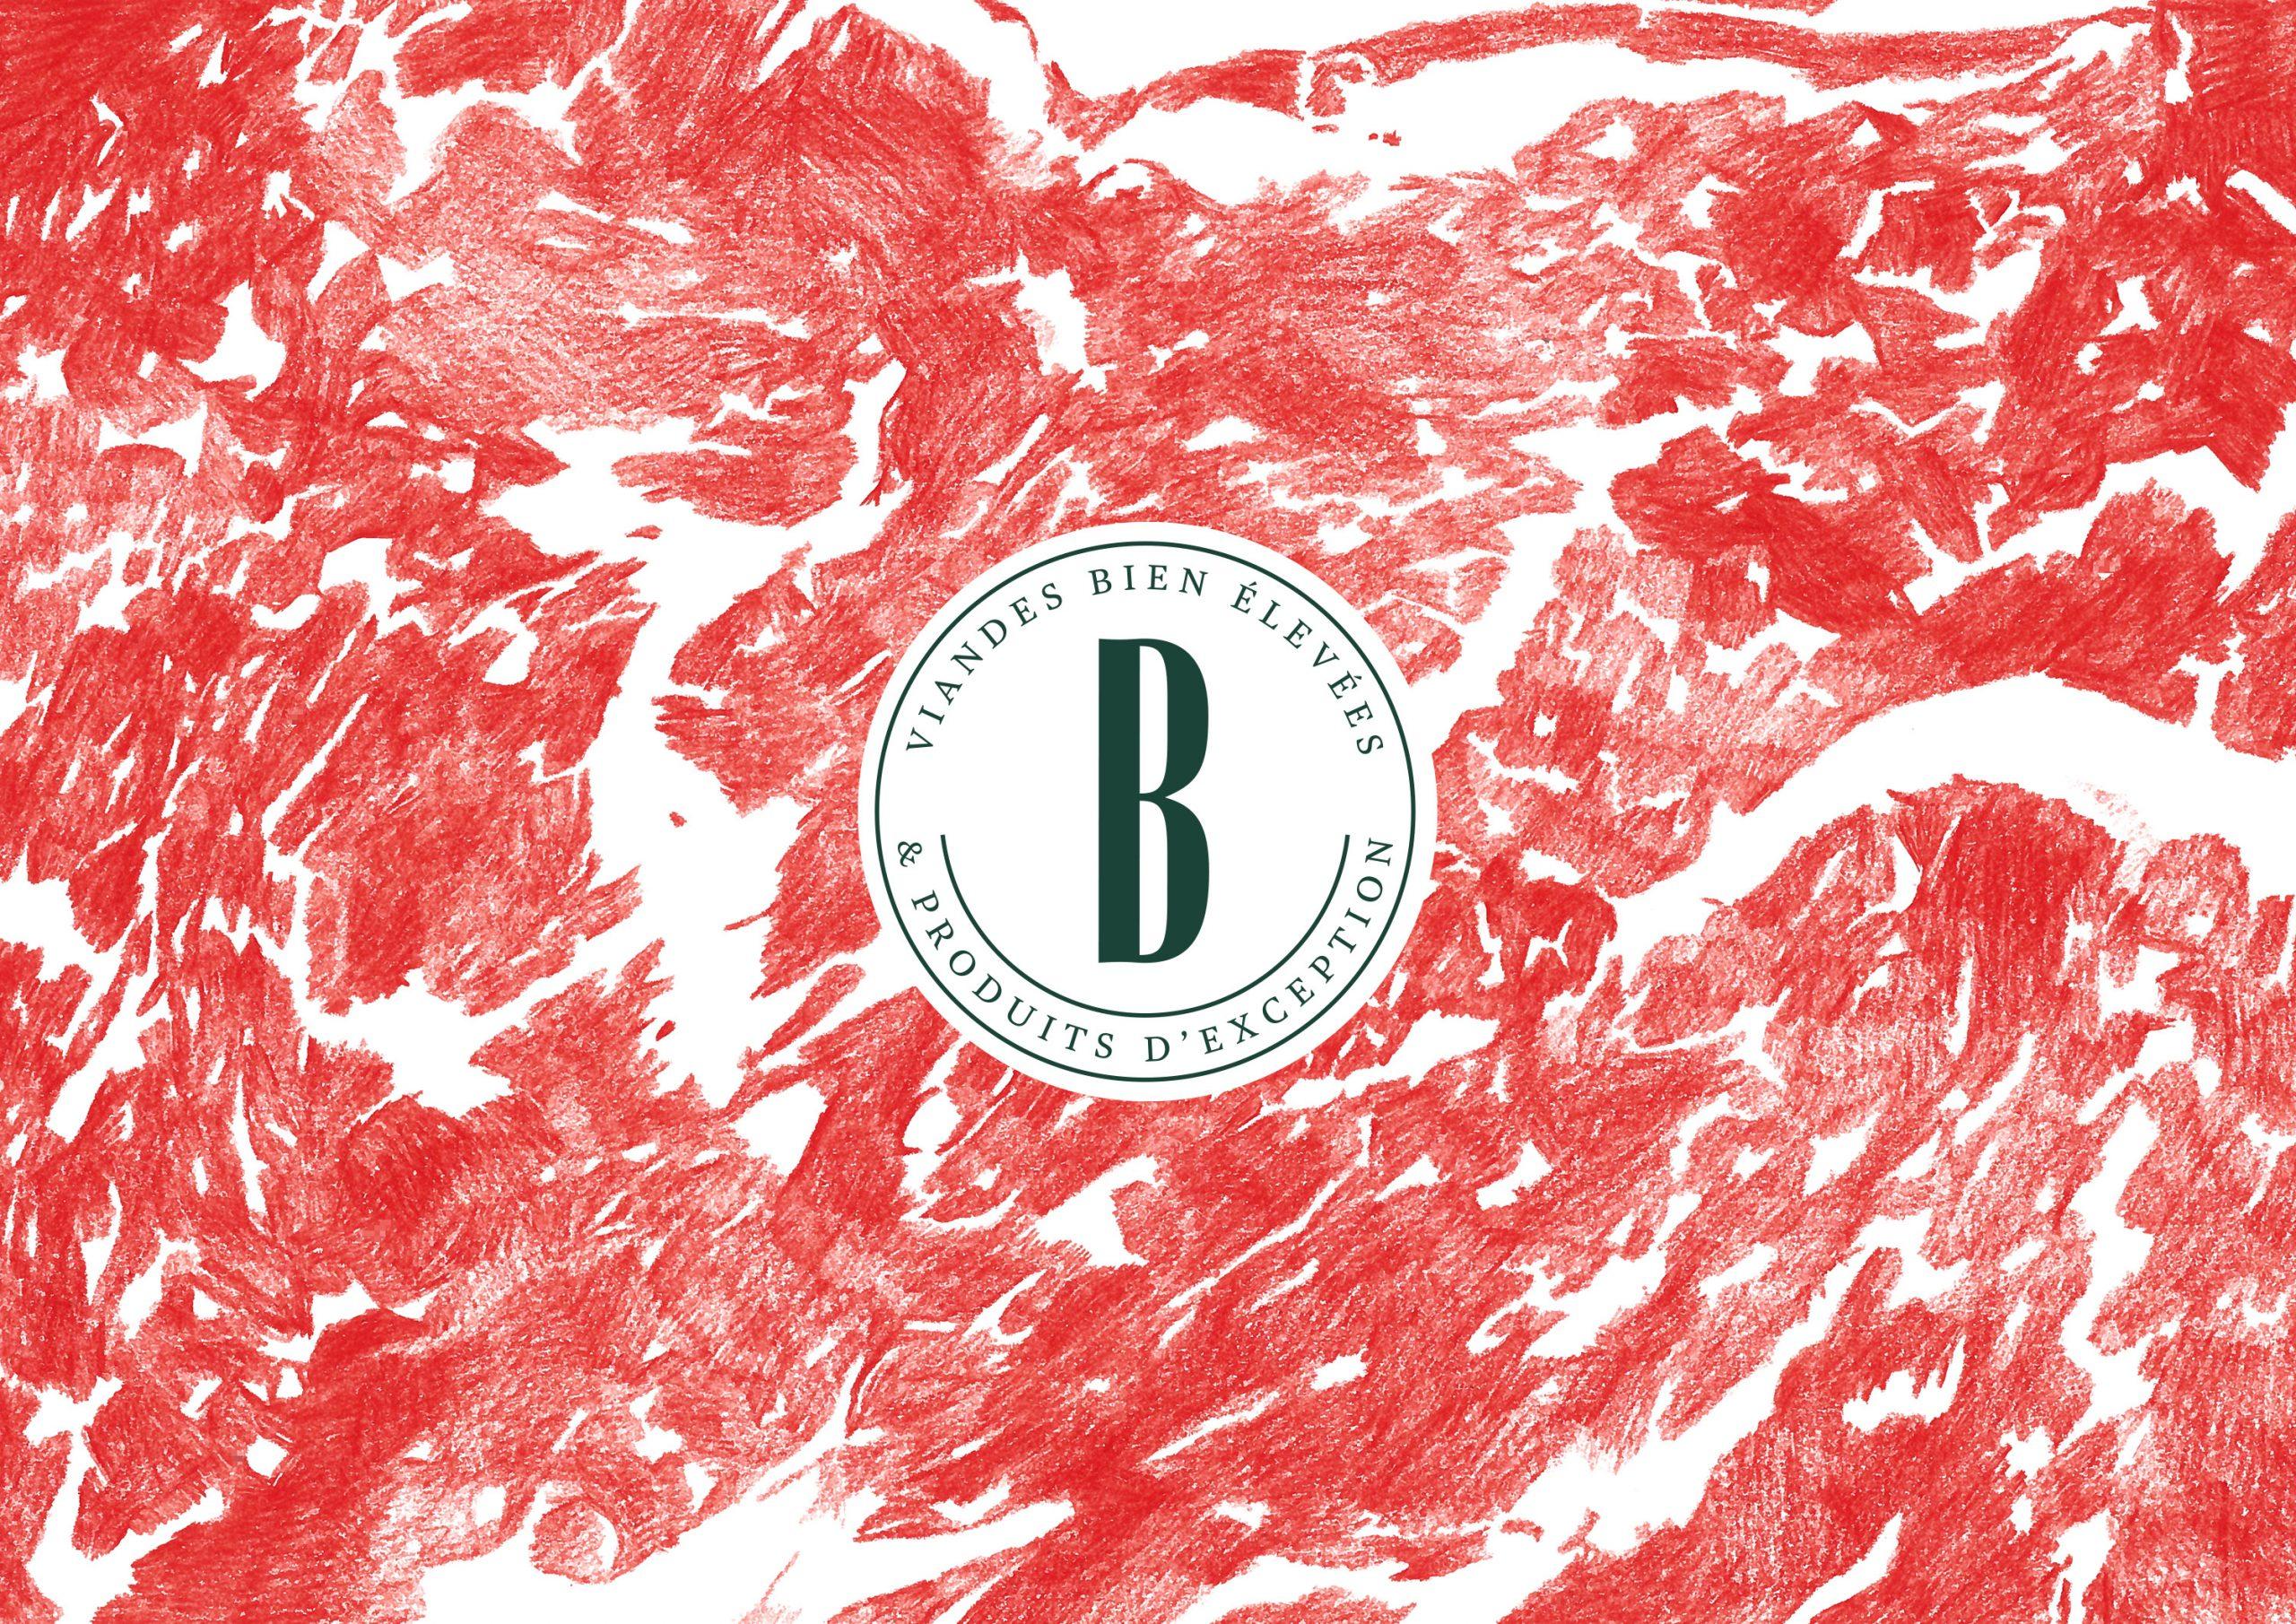 Beaugrain pattern viandes